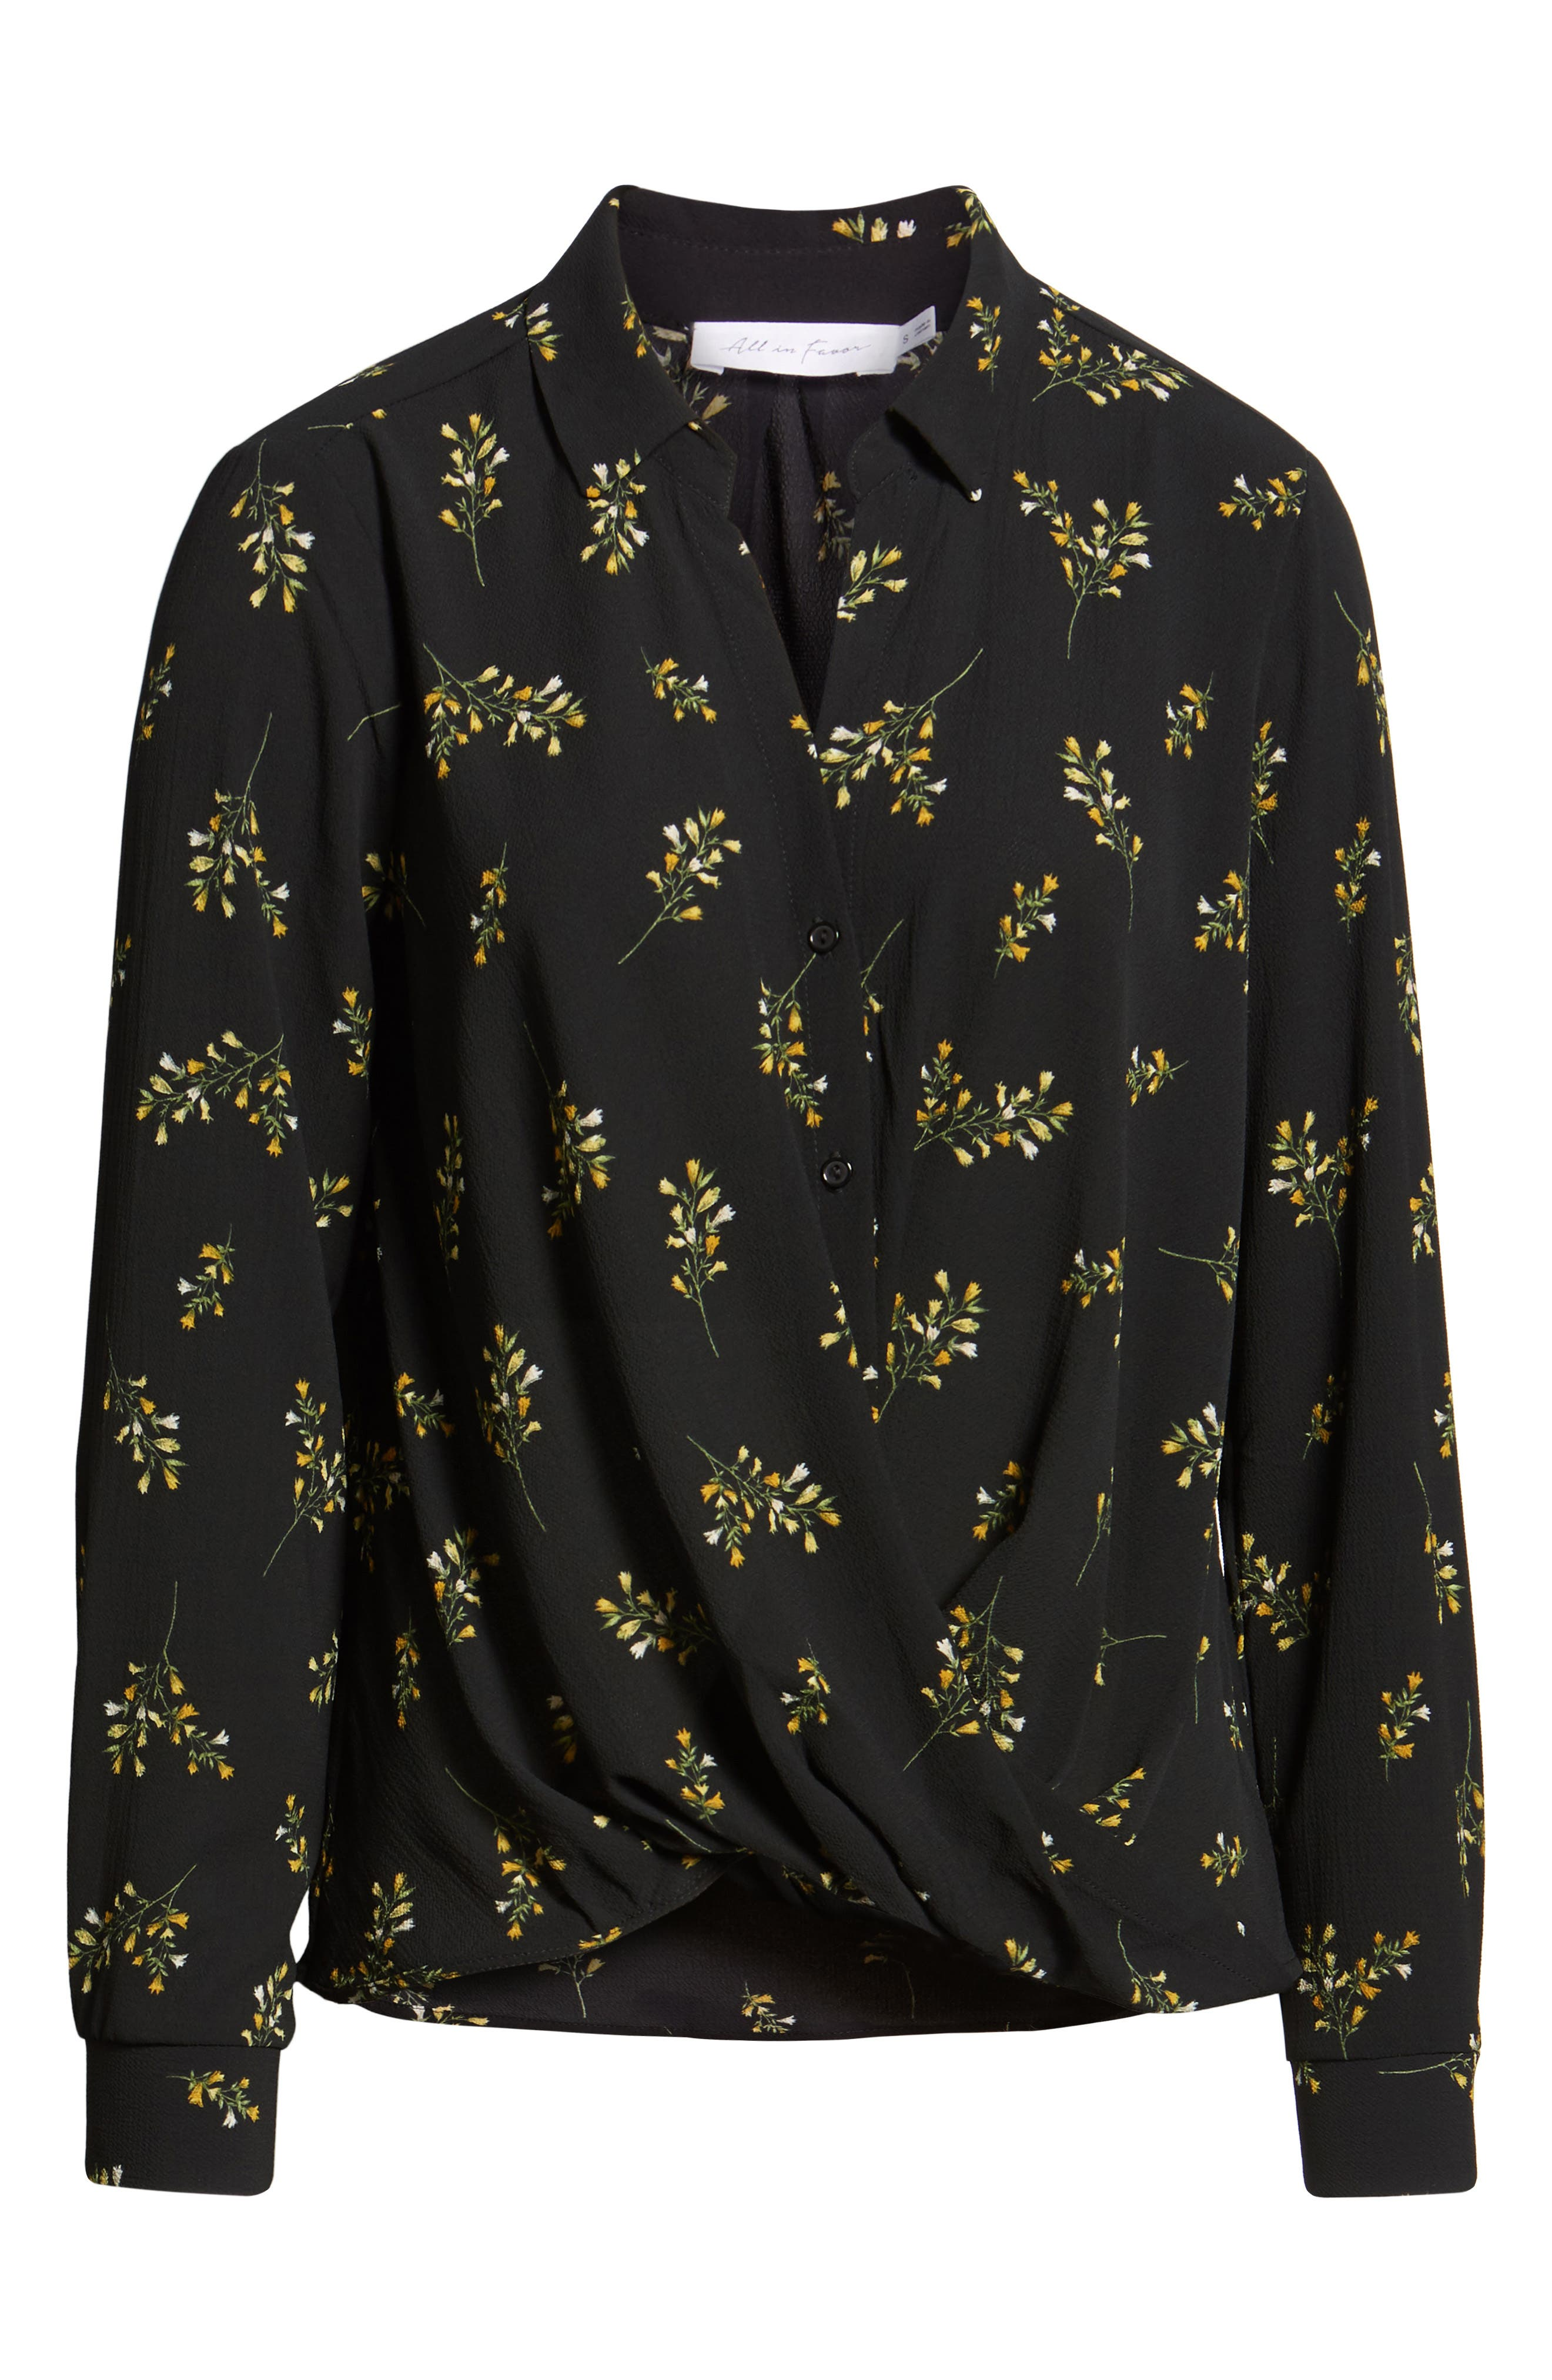 Patterned Drape Front Blouse,                             Alternate thumbnail 6, color,                             BLACK GROUND FLORAL